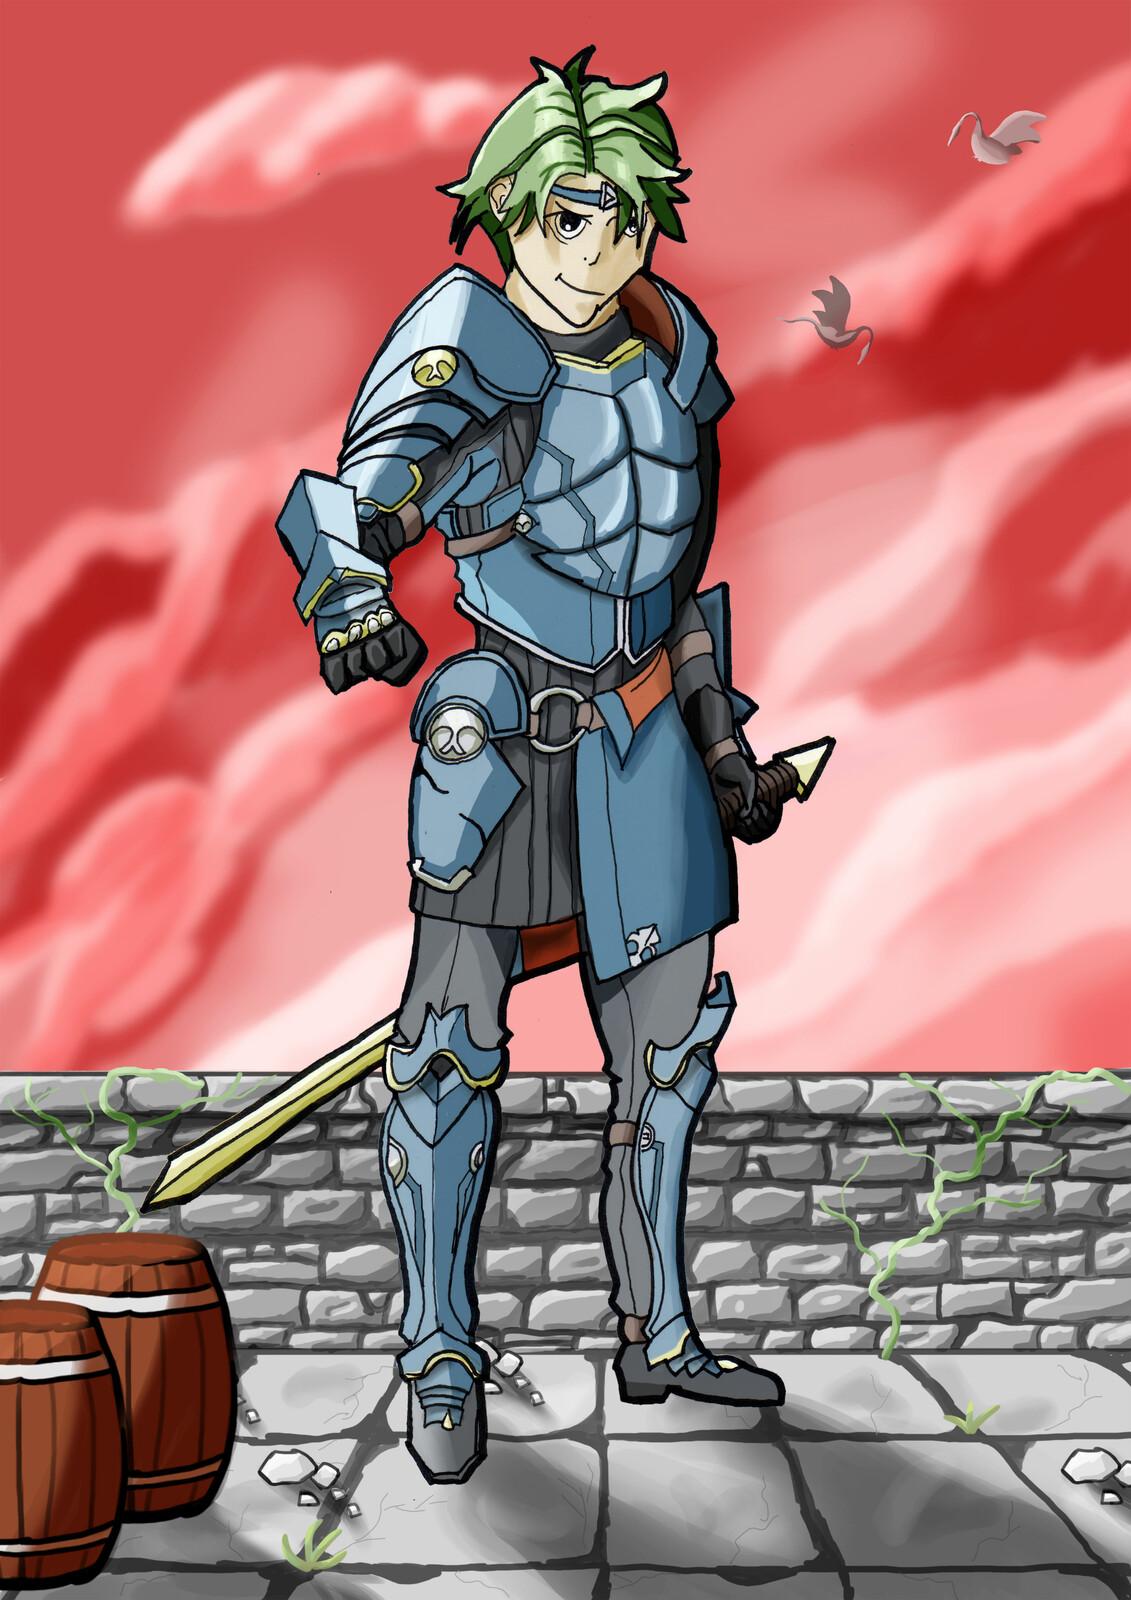 Un personnage de Fire Emblem / A Fire Emblem Hero